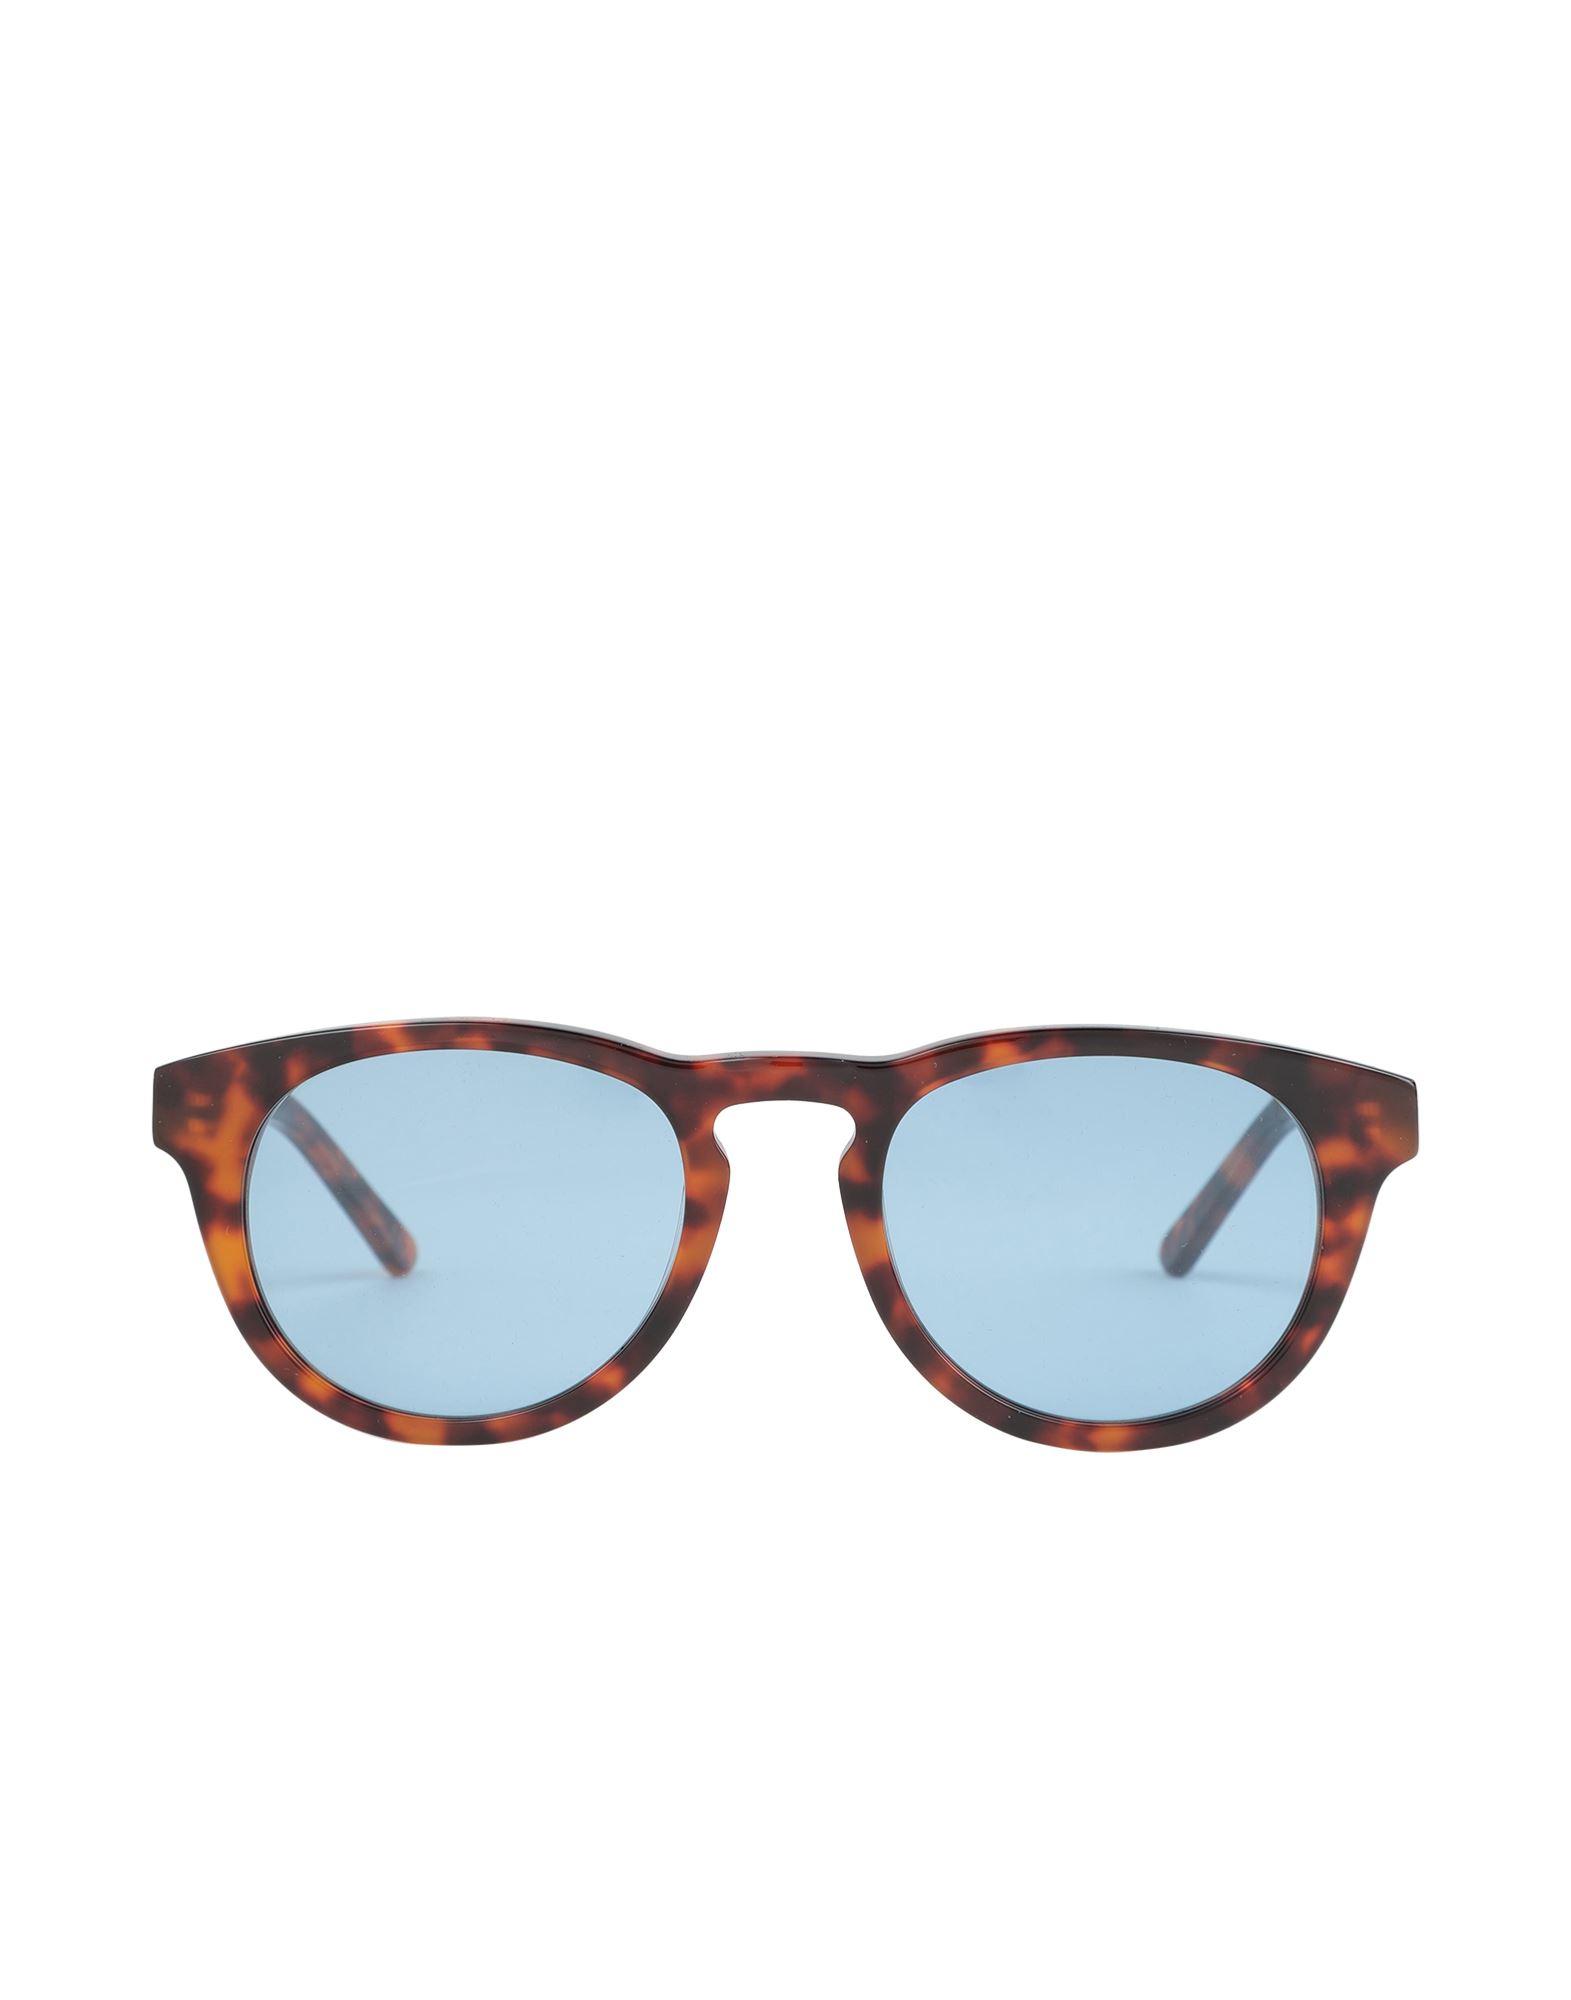 HAN KJØBENHAVN Sunglasses - Item 46737532